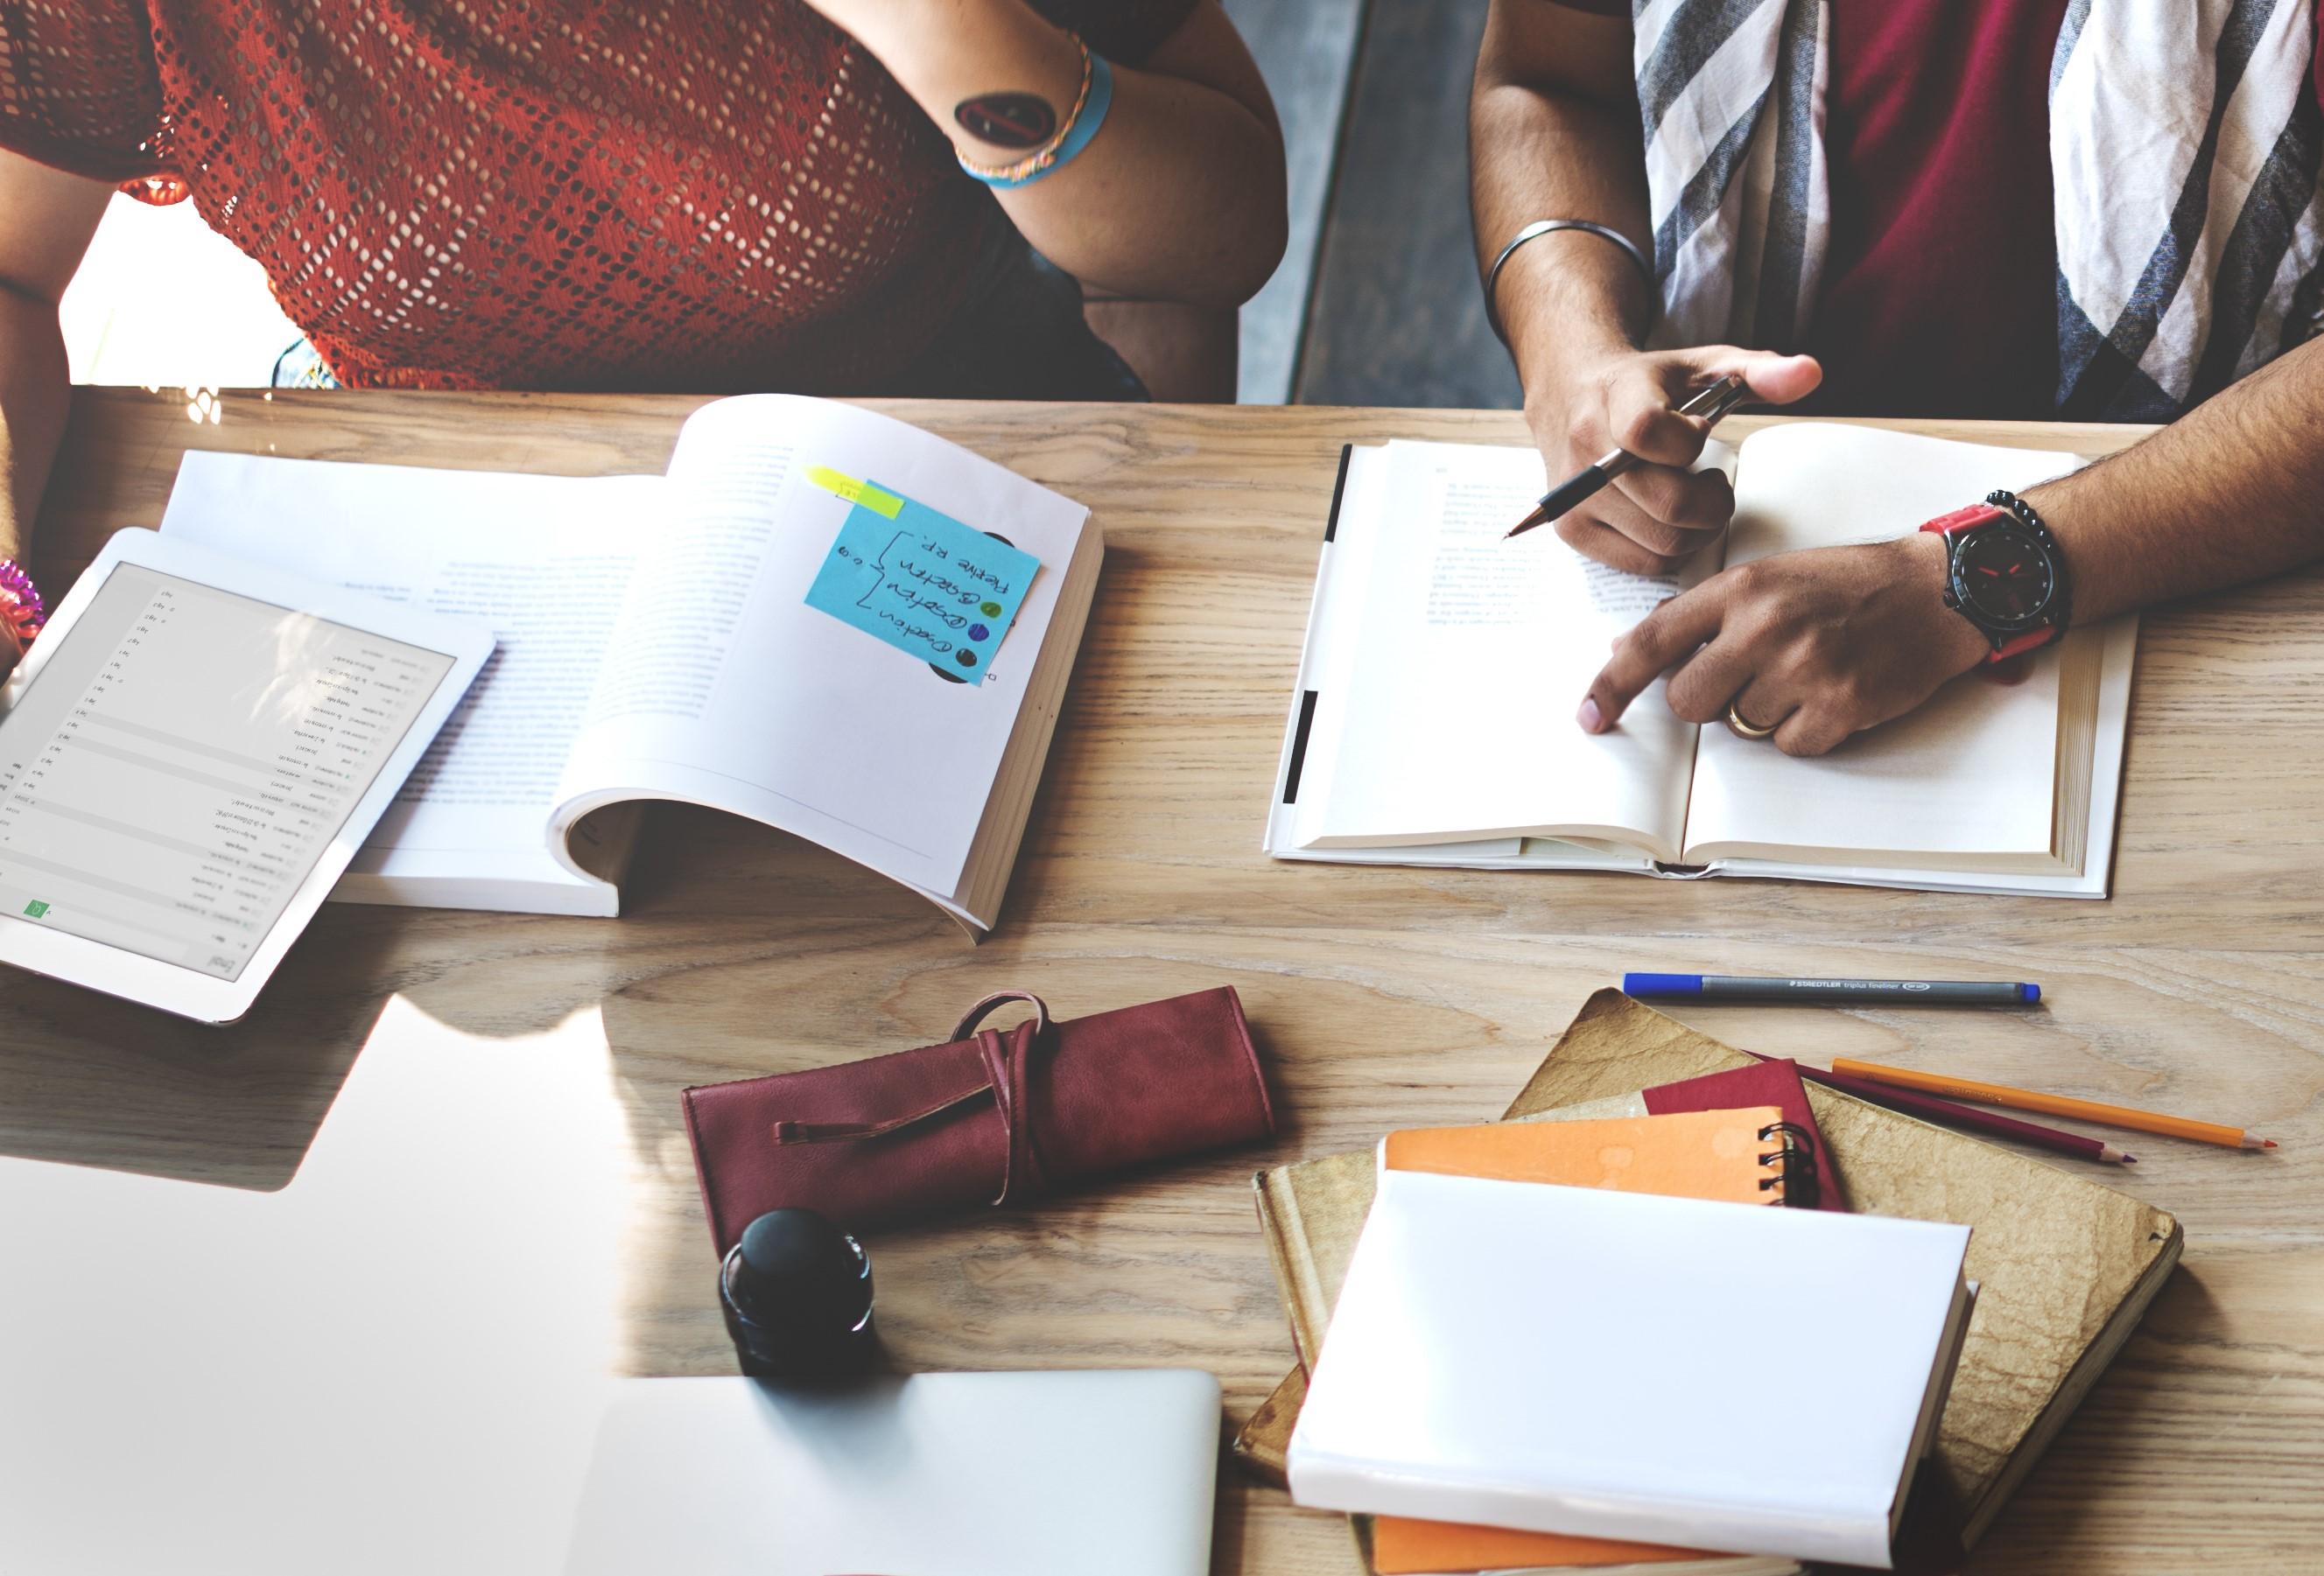 Case Studies bearbeitet Personen am lernen